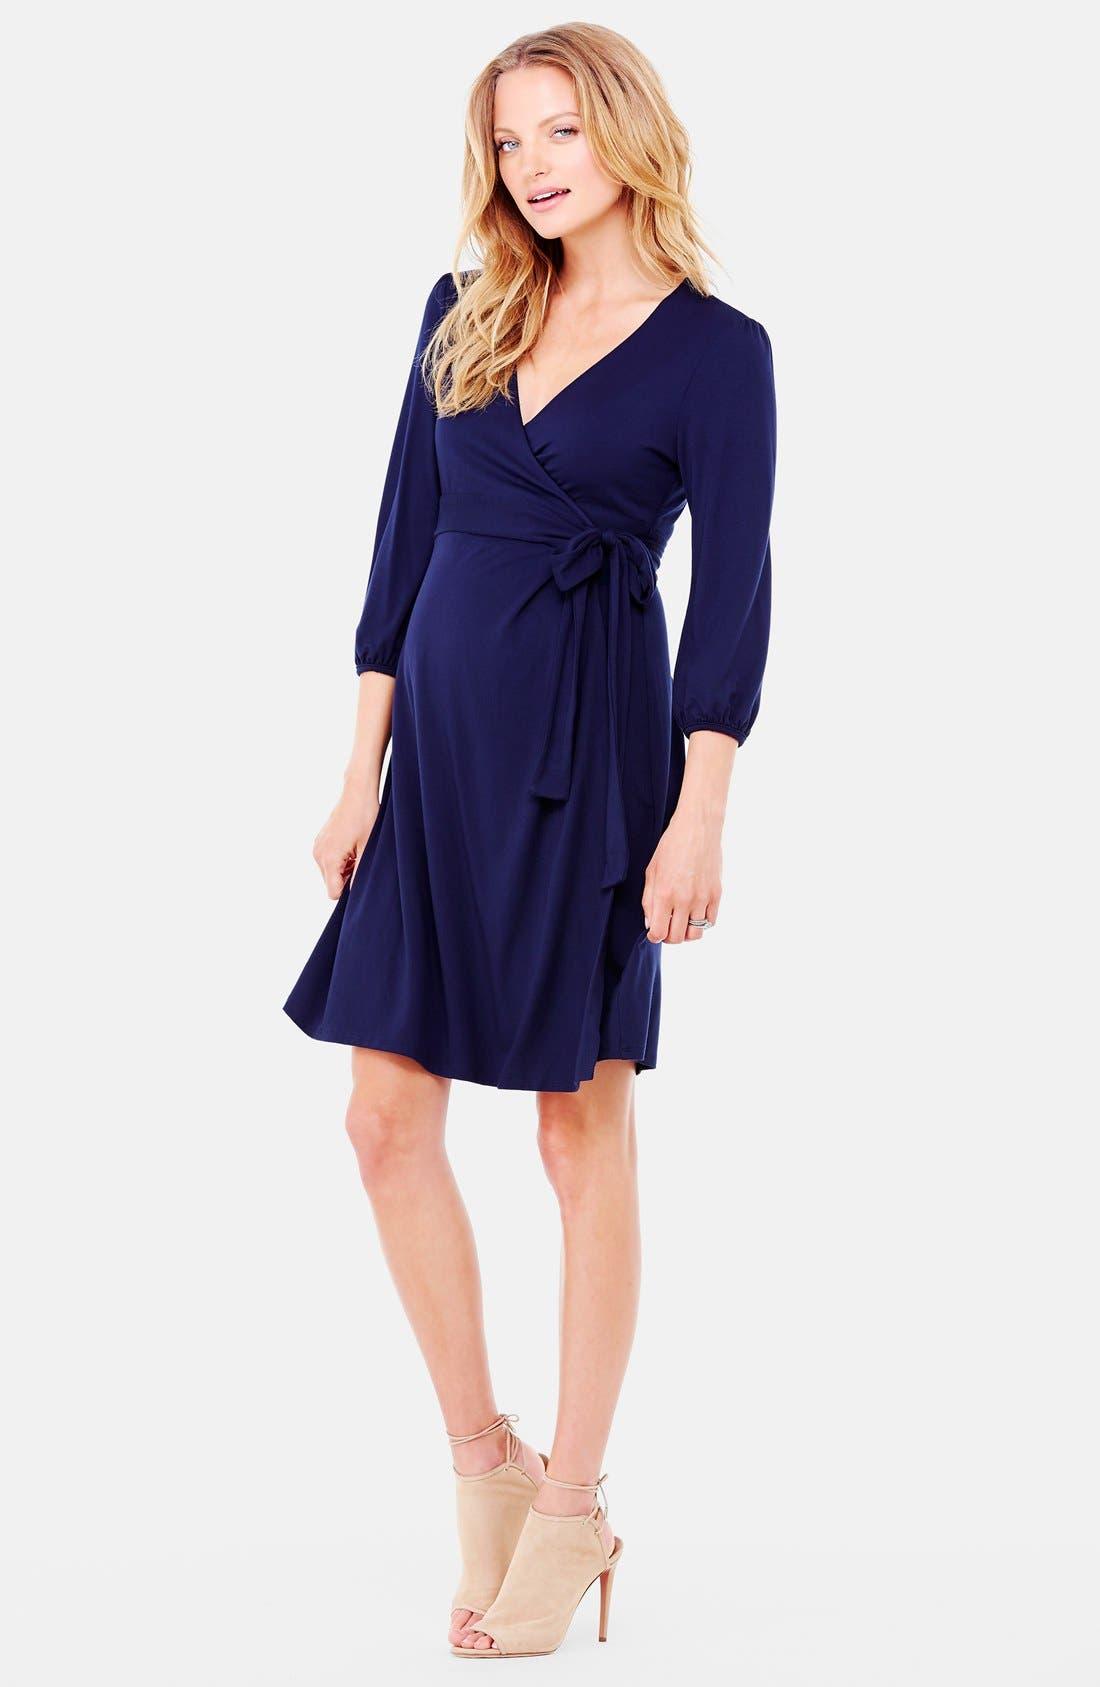 Nursing Friendly Maternity Wrap Dress,                             Alternate thumbnail 12, color,